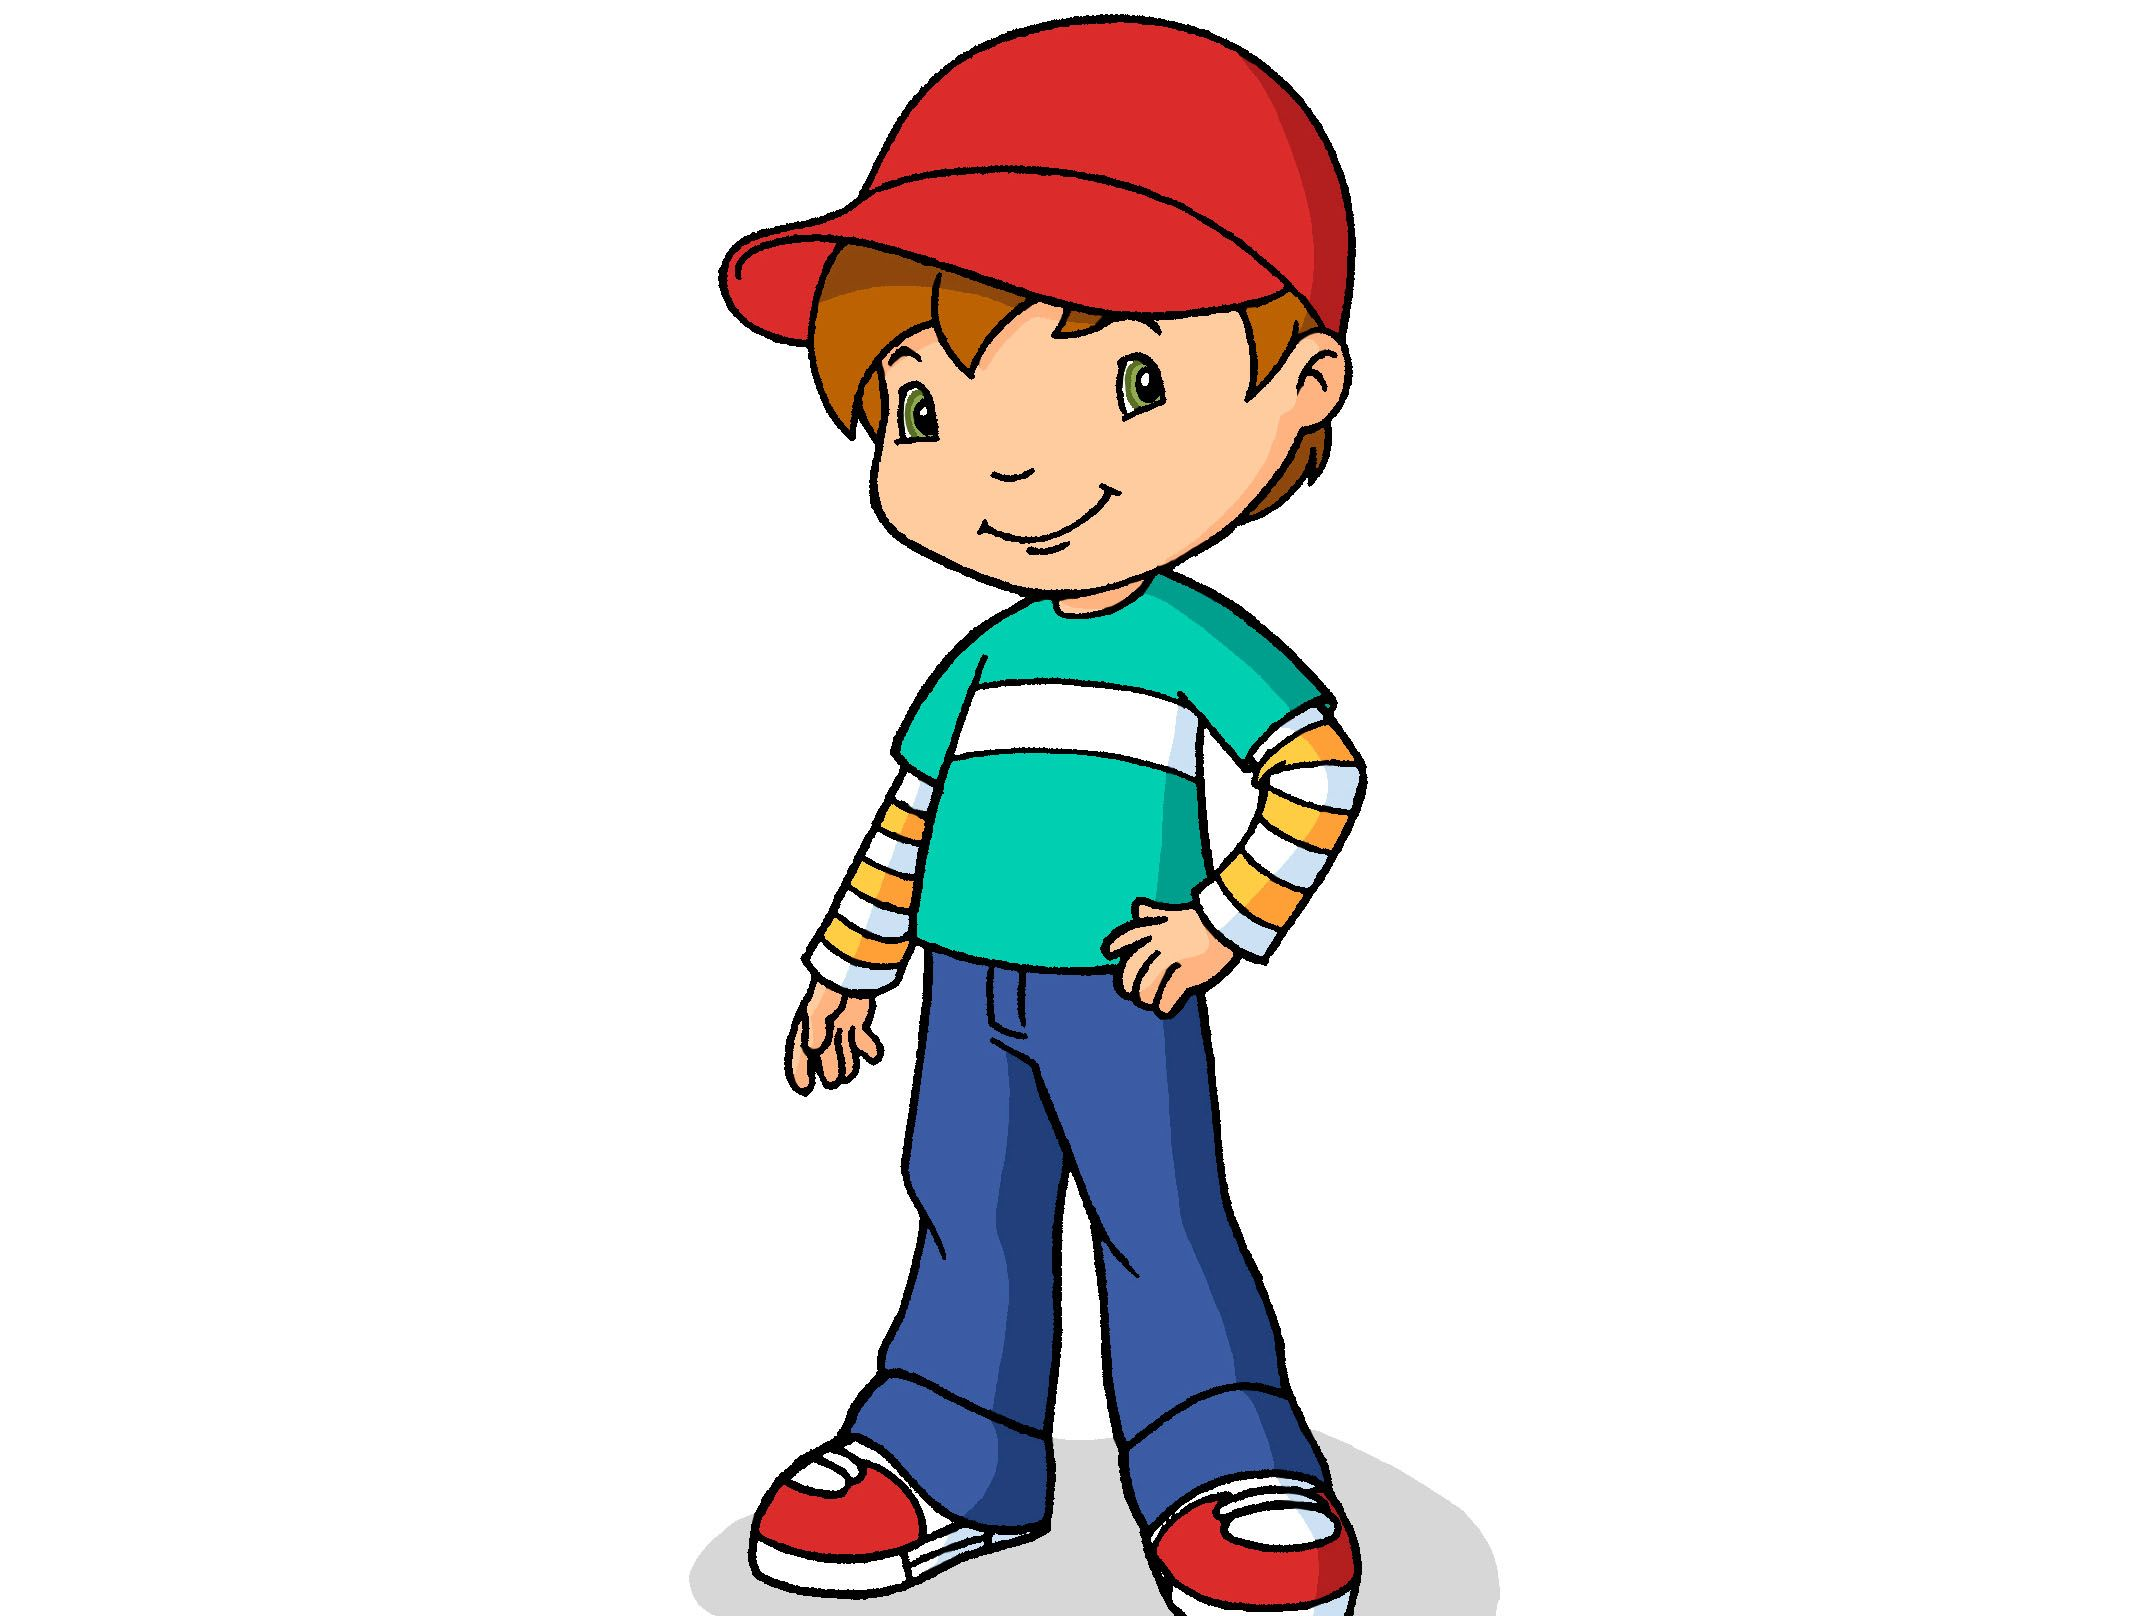 petit gar on dessin maternelle houssni pinterest cartoon boy cartoon et character. Black Bedroom Furniture Sets. Home Design Ideas